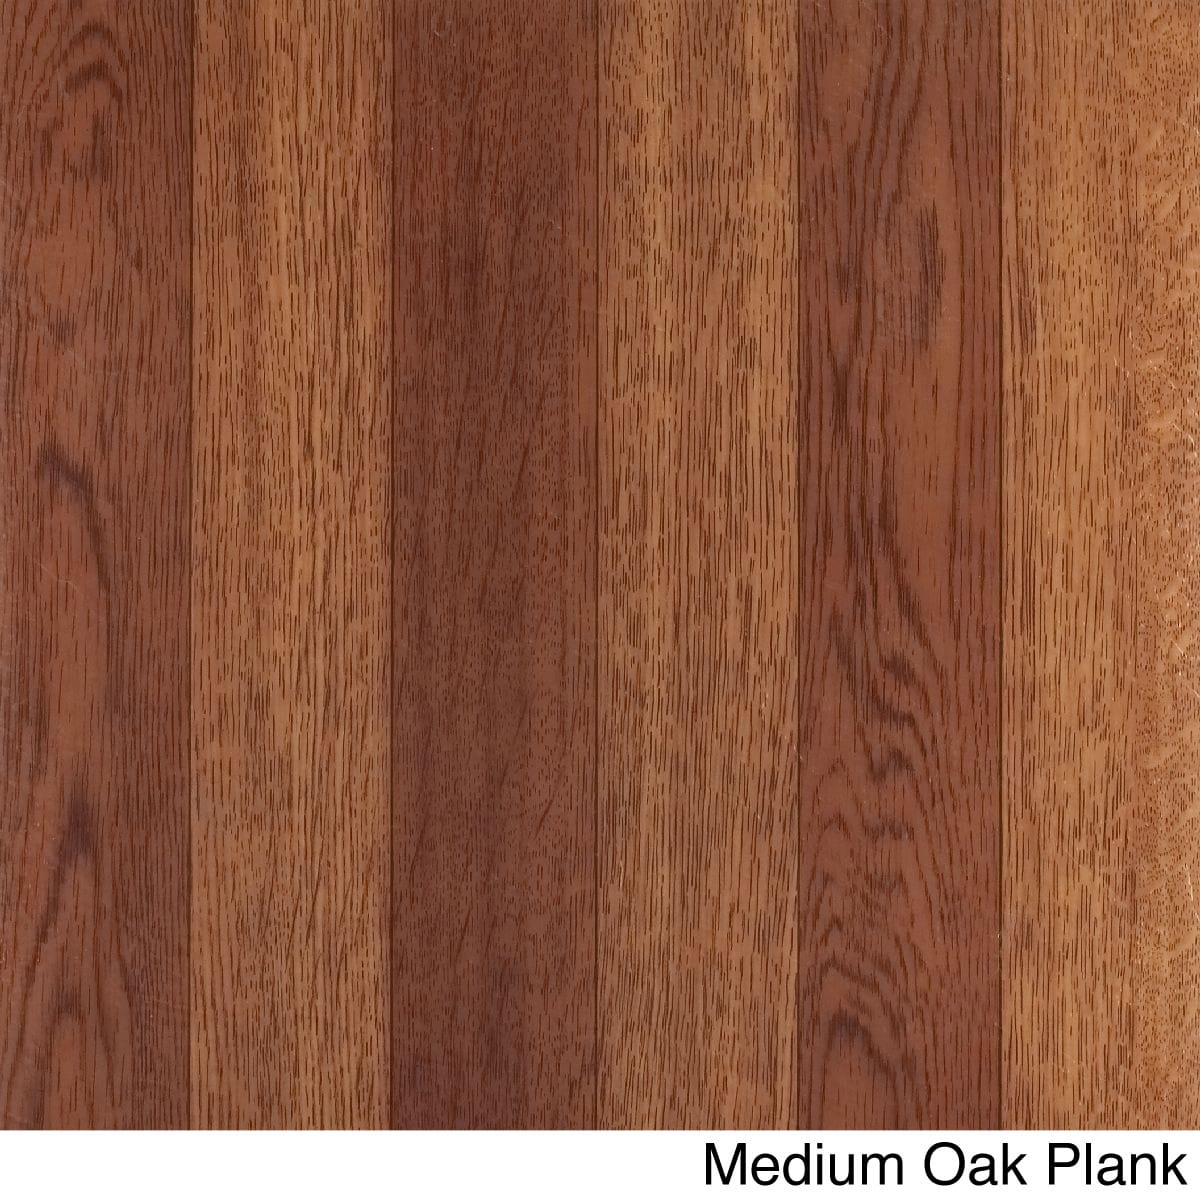 Achim nexus wood look 12x12 self adhesive vinyl floor tile 20 tiles achim nexus wood look 12x12 self adhesive vinyl floor tile 20 tiles free shipping on orders over 45 overstock 15774759 dailygadgetfo Image collections